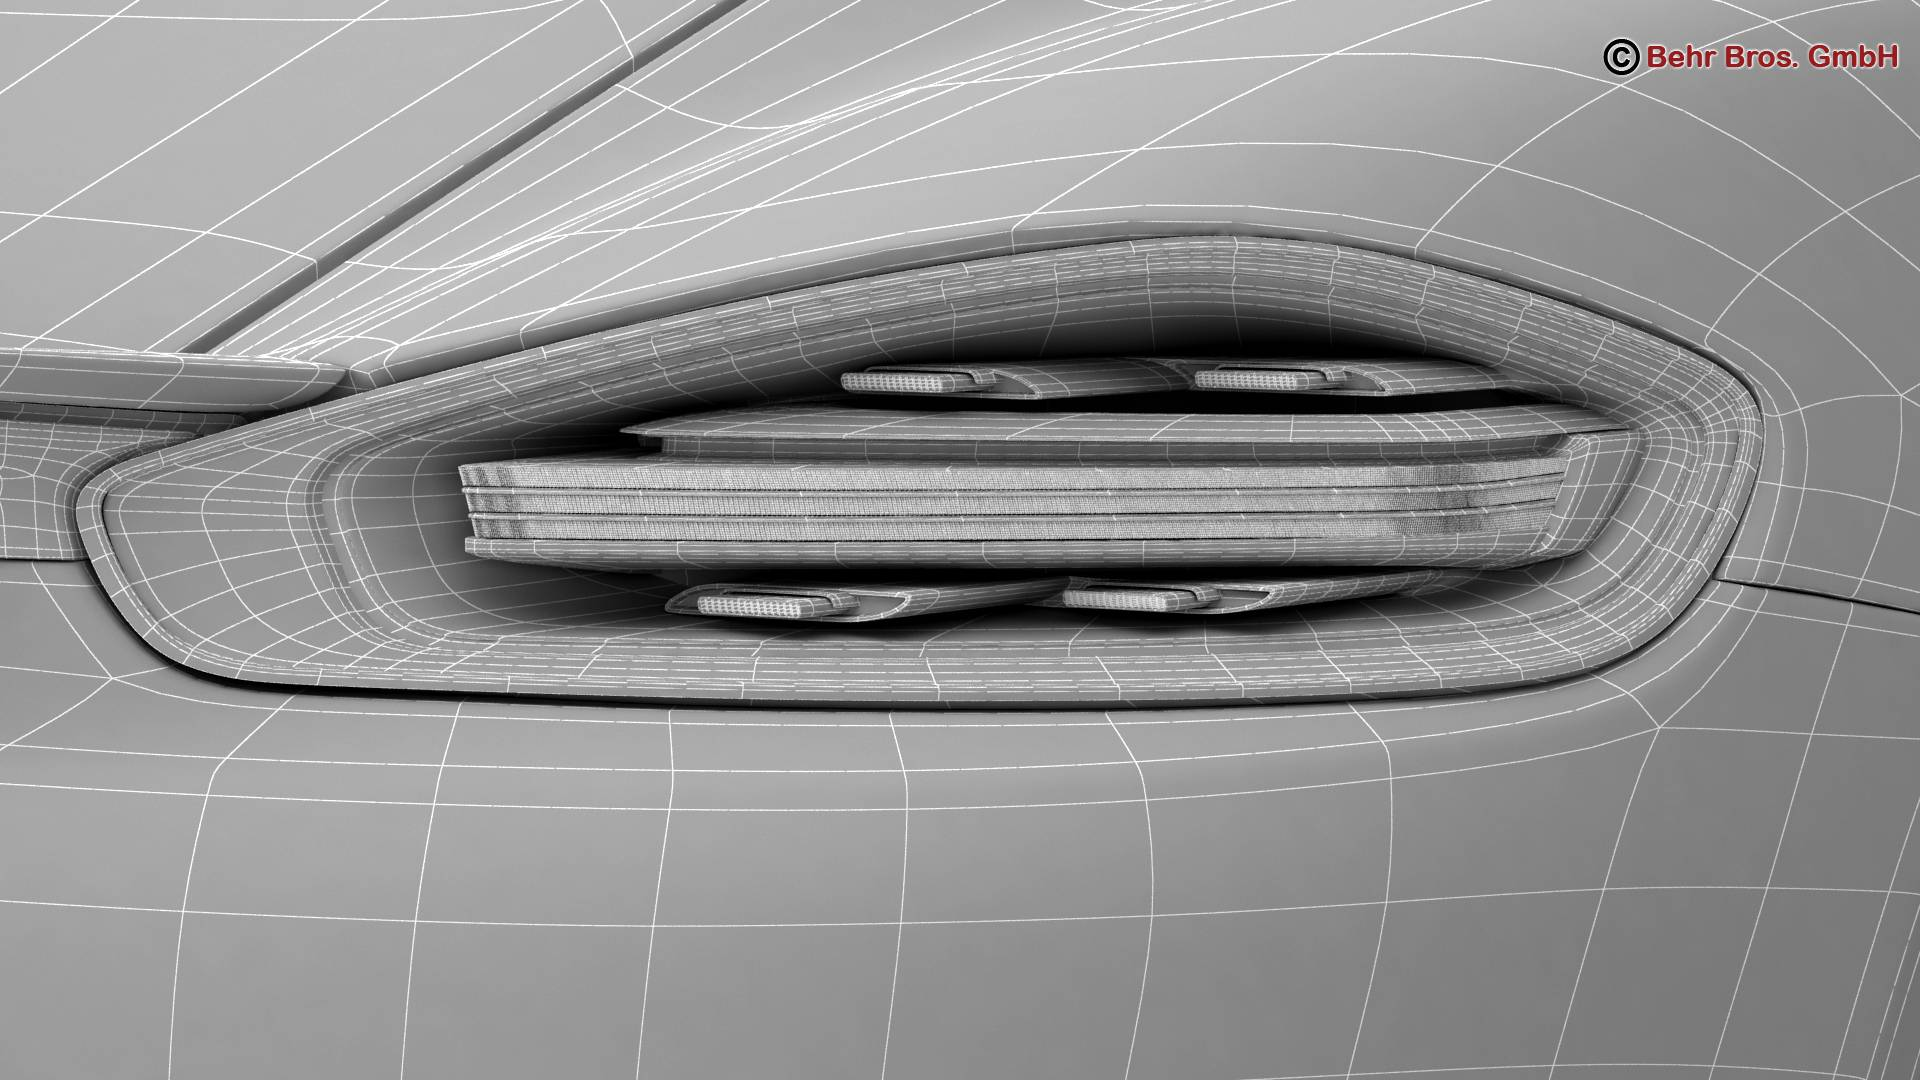 porsche 718 cayman 2017 3d model 3ds max fbx c4d lwo ma mb obj 220095